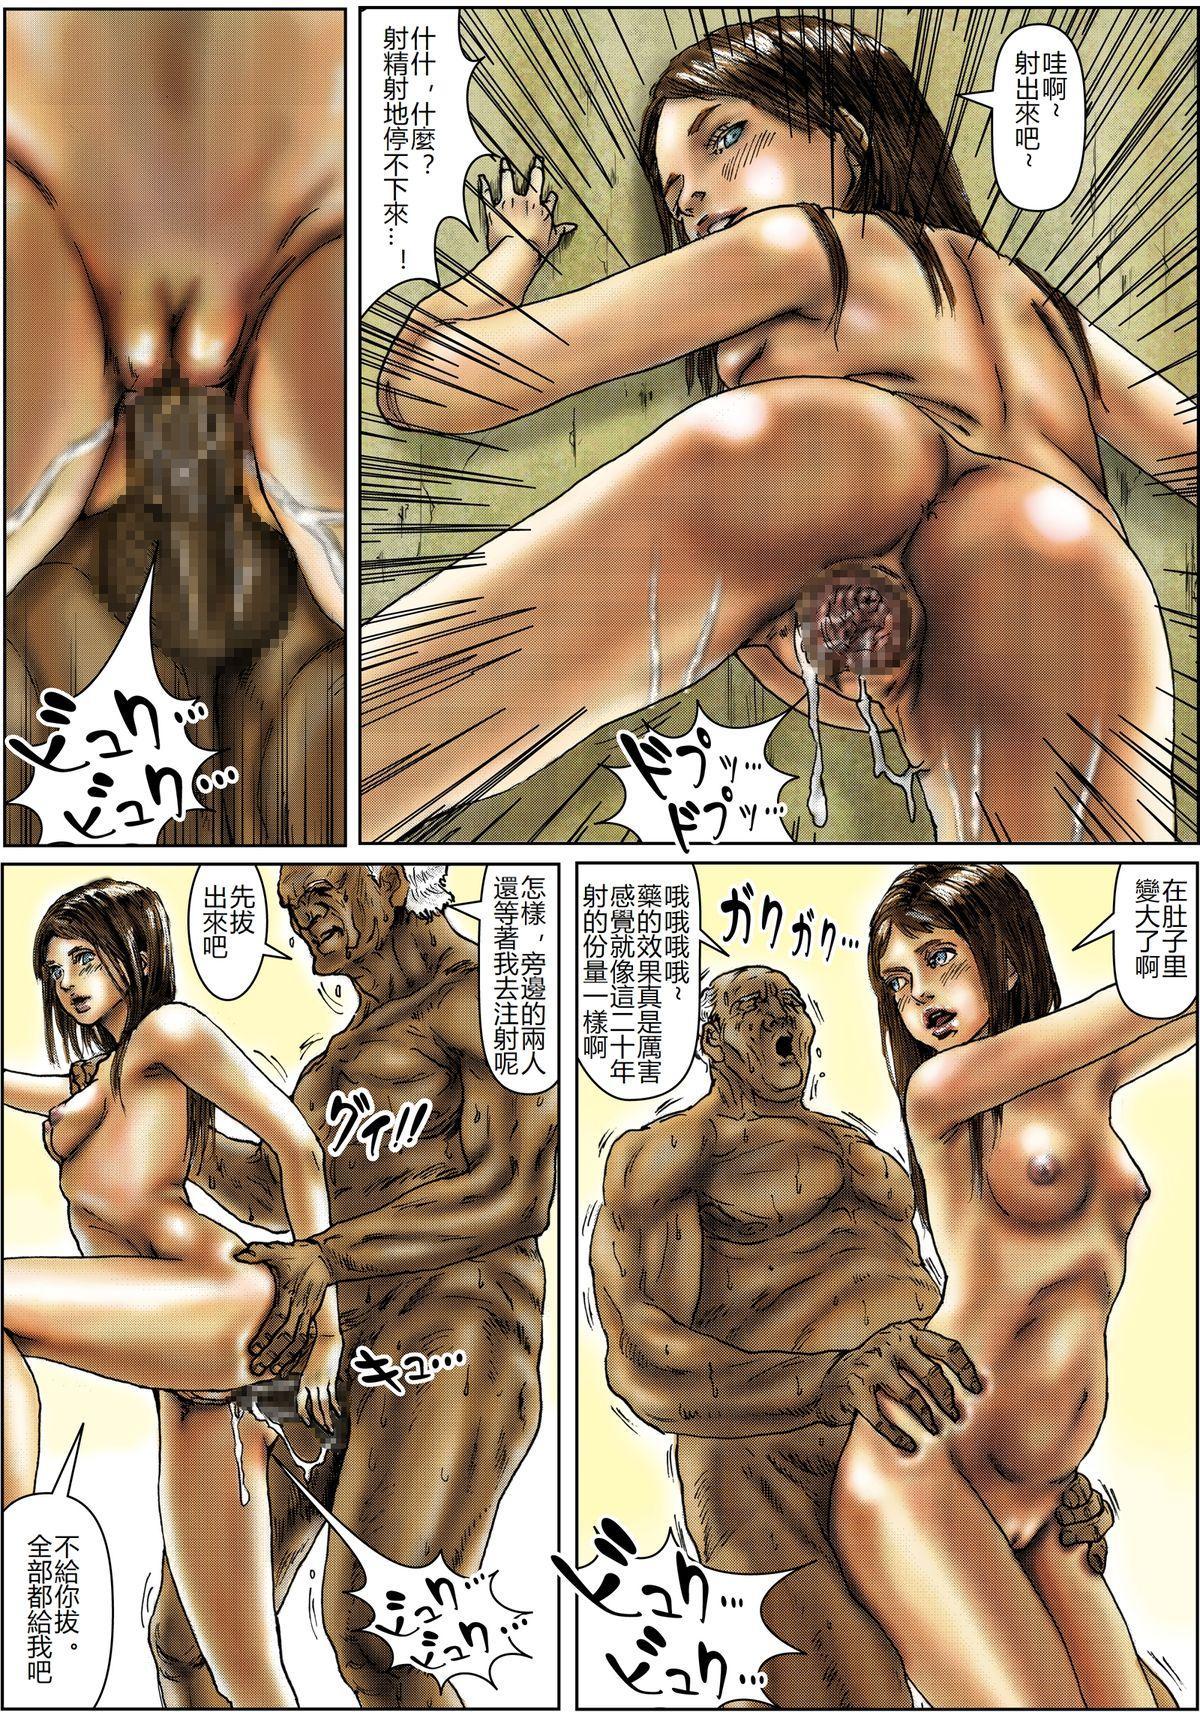 BODY HAZARD 5 Shushou Hen 36